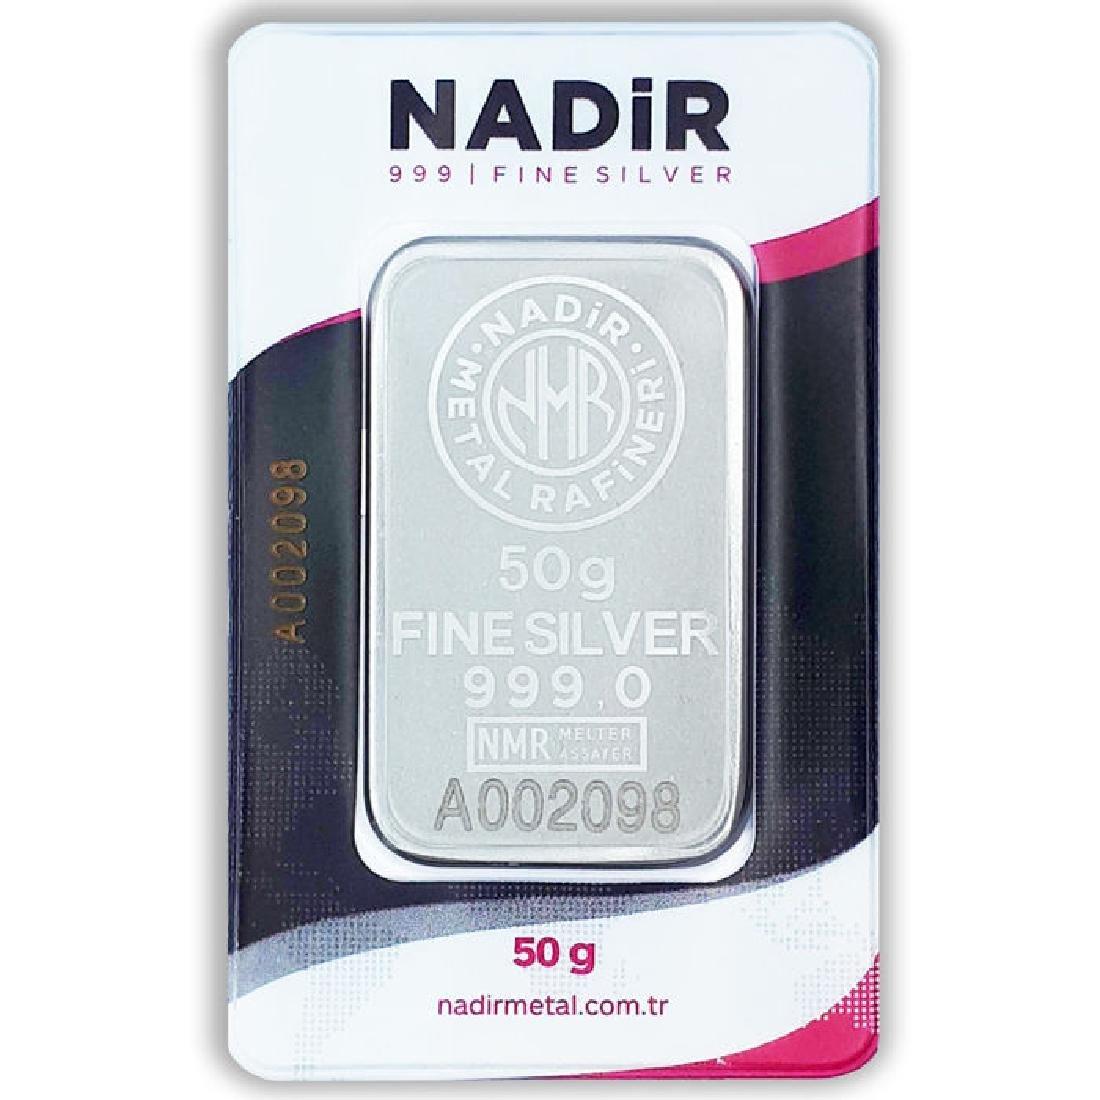 50 gr. - 999/1000 - Minted/ Sealed Silver bar - 3